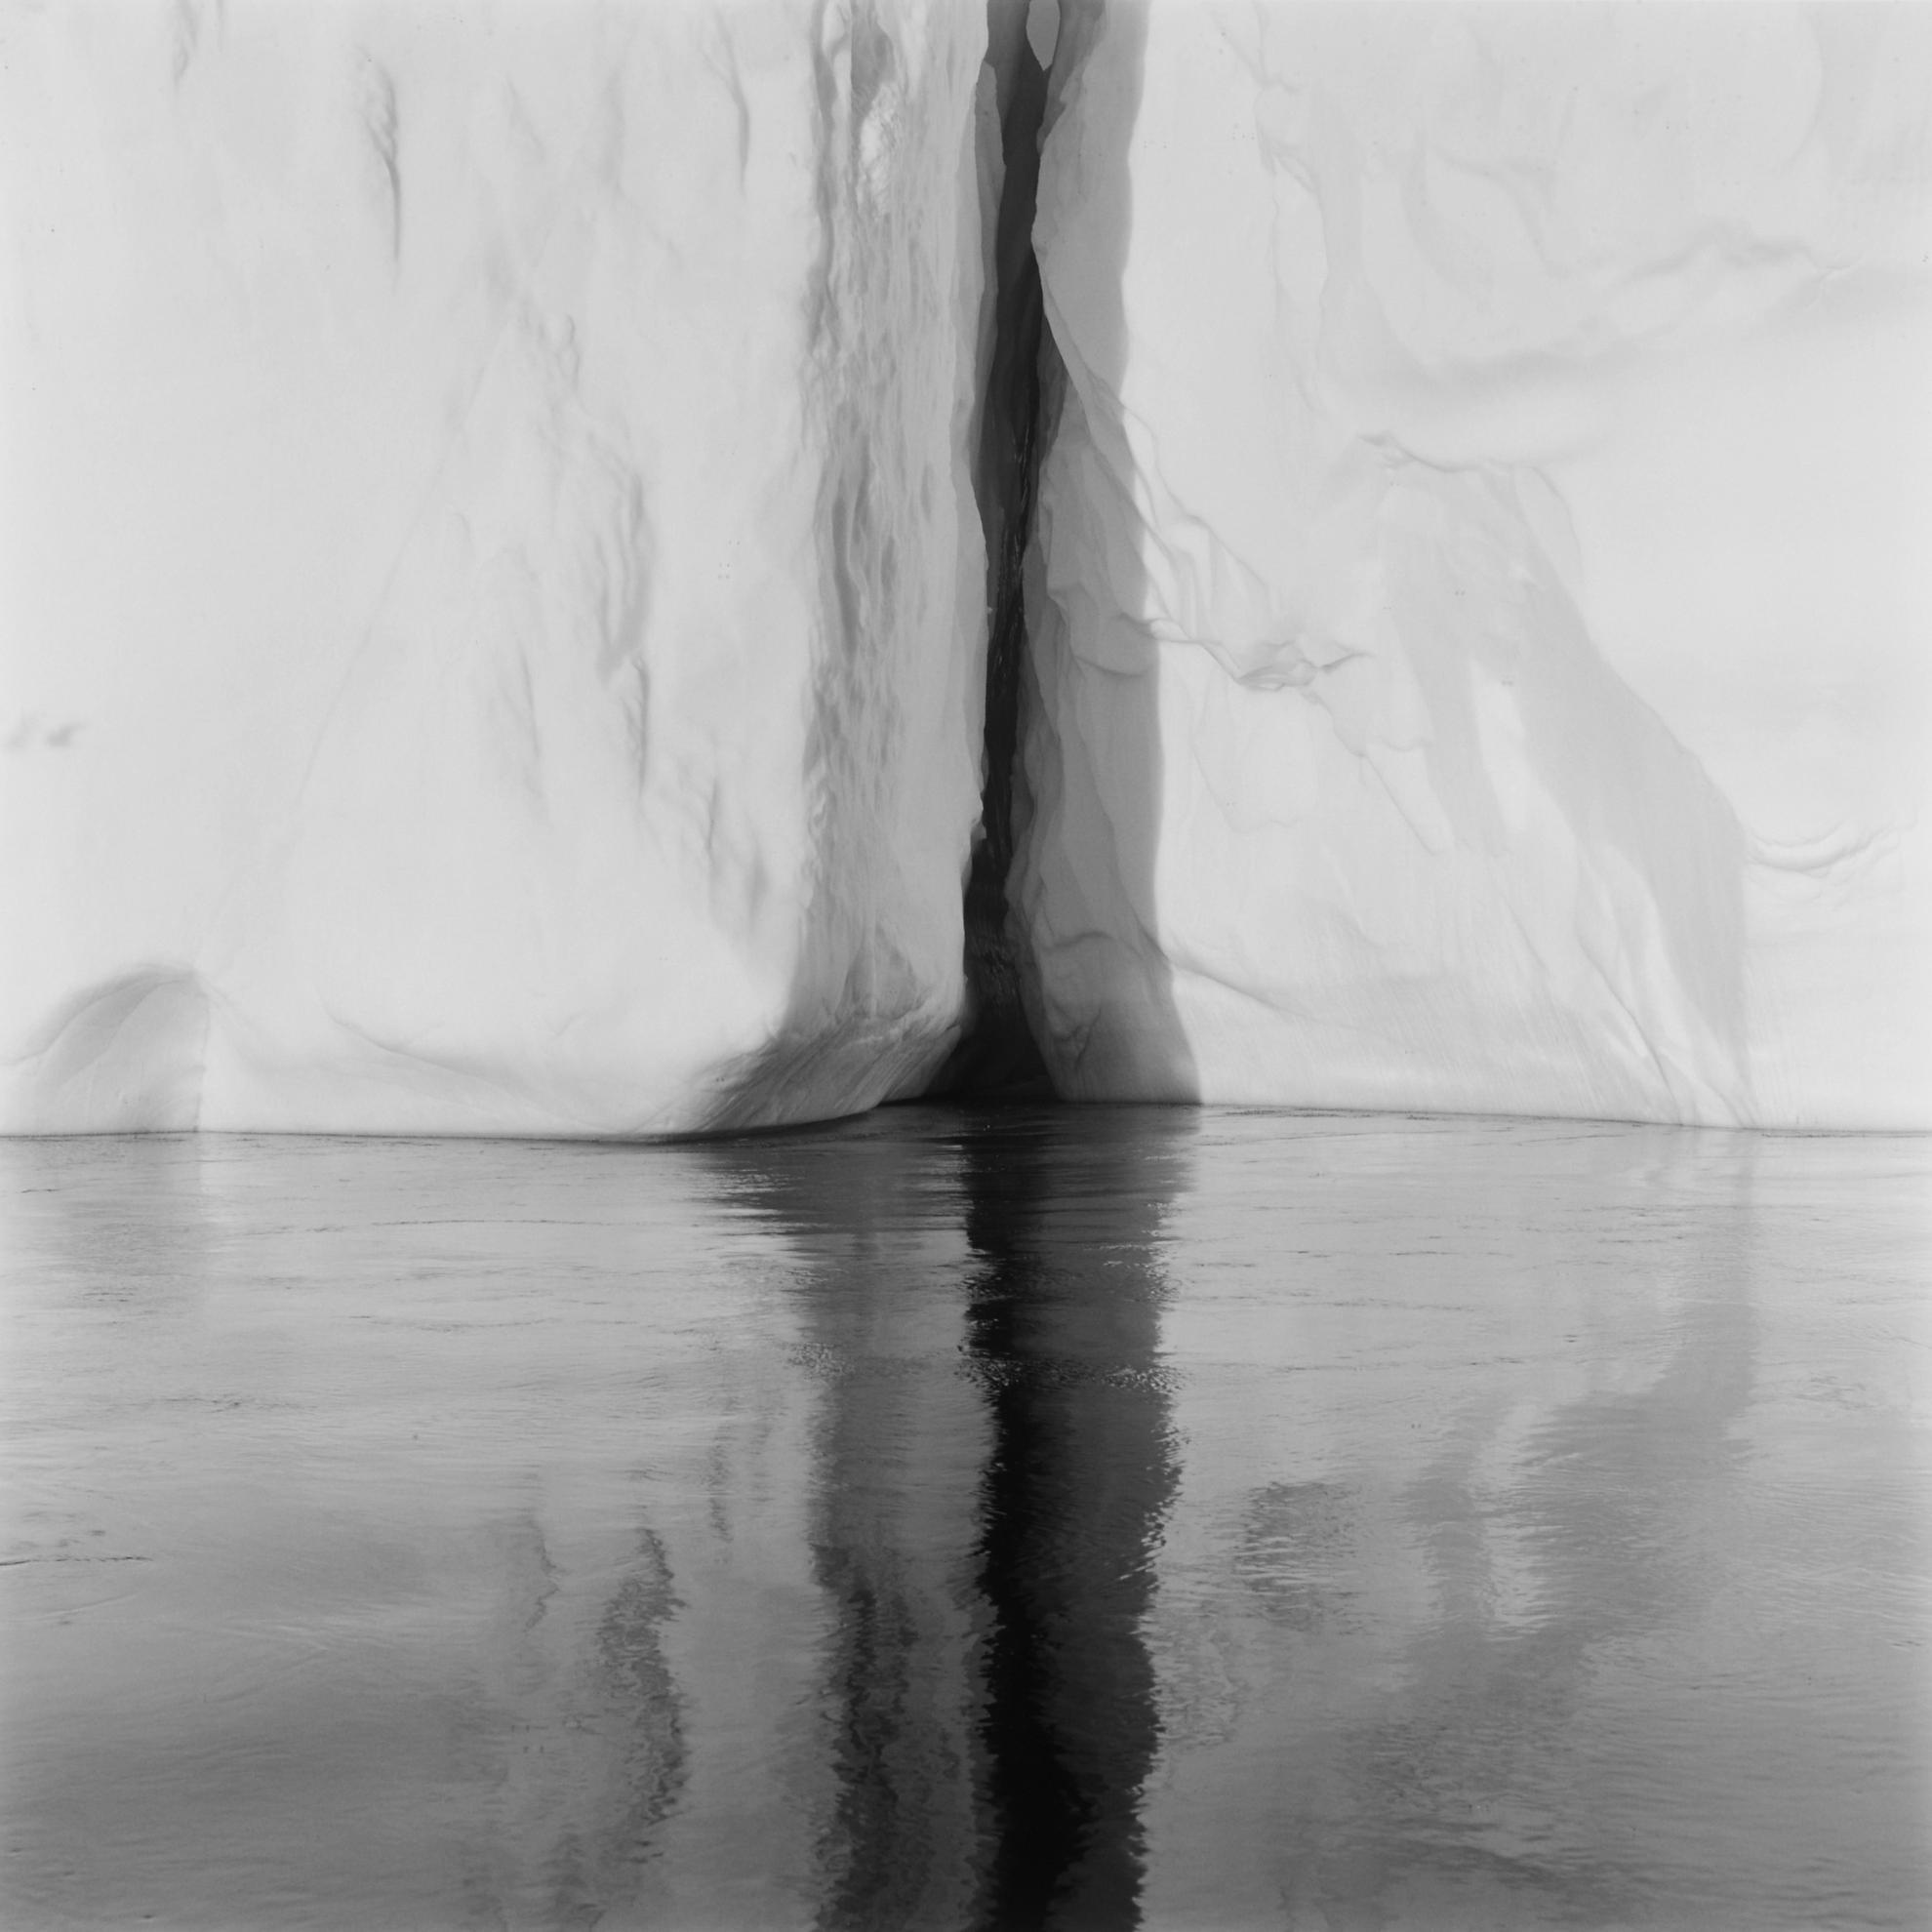 Lynn Davis-Iceberg No. 30, Disko Bay, Greenland-2000